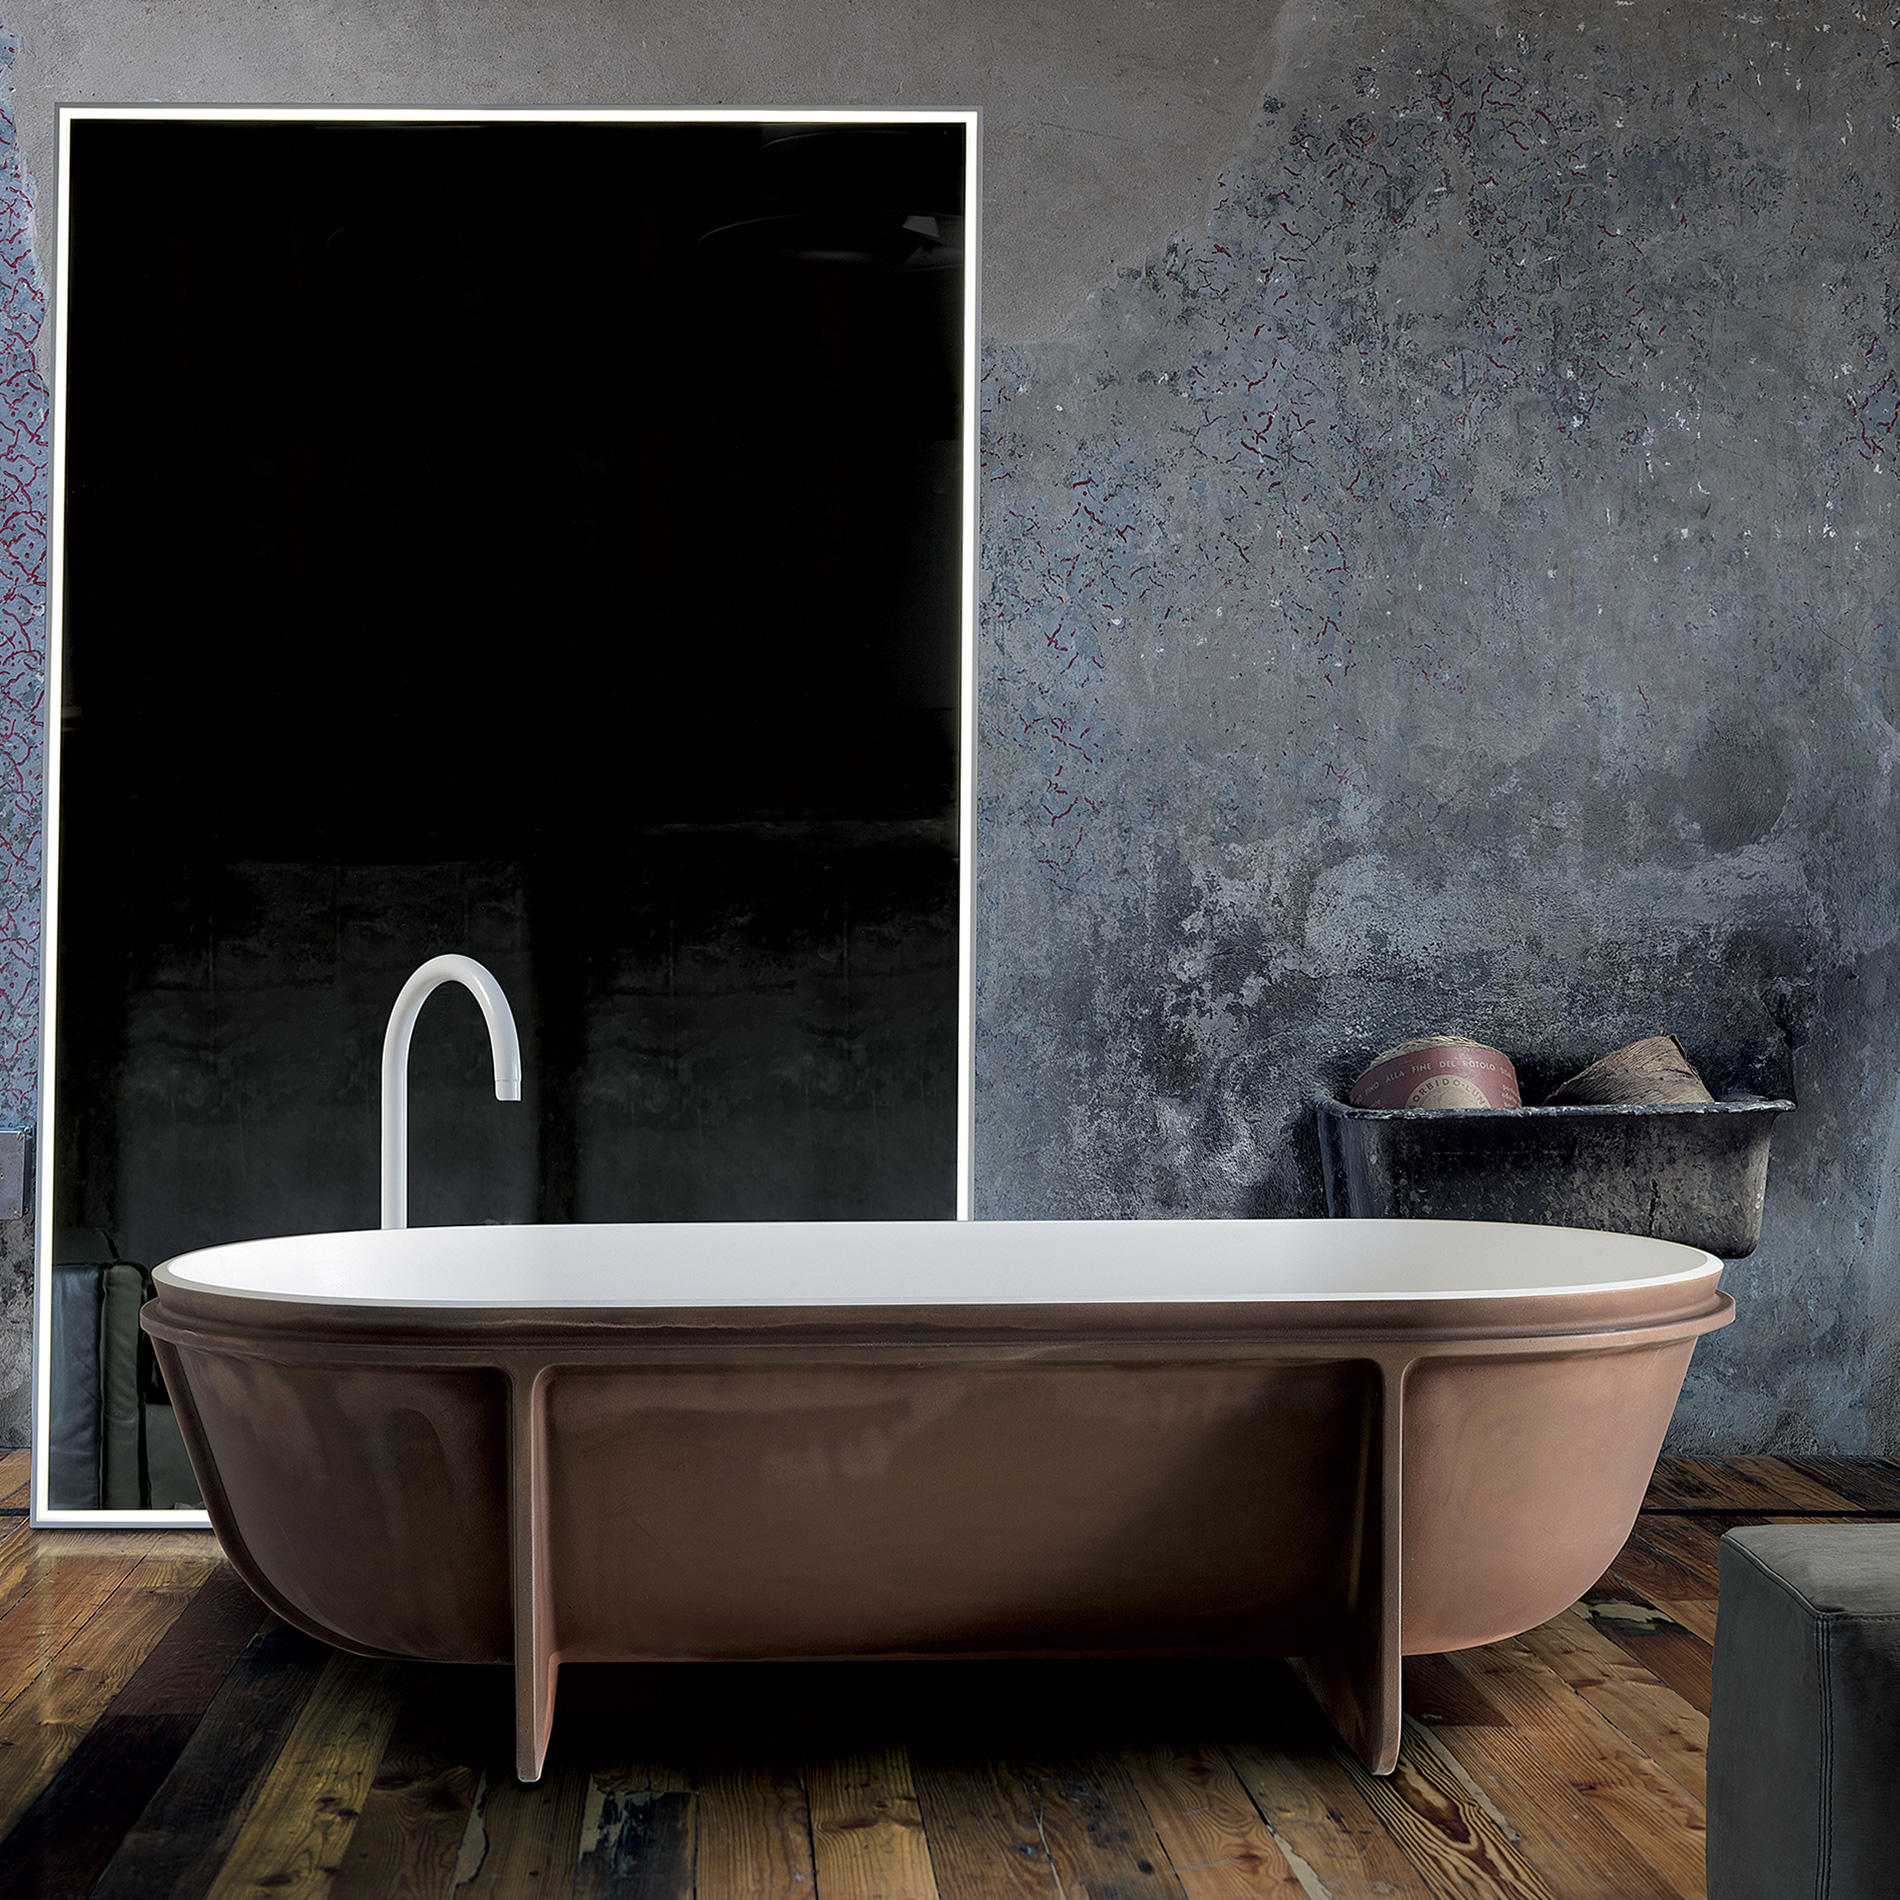 Nicos-International-home-products-Falper-tub-2